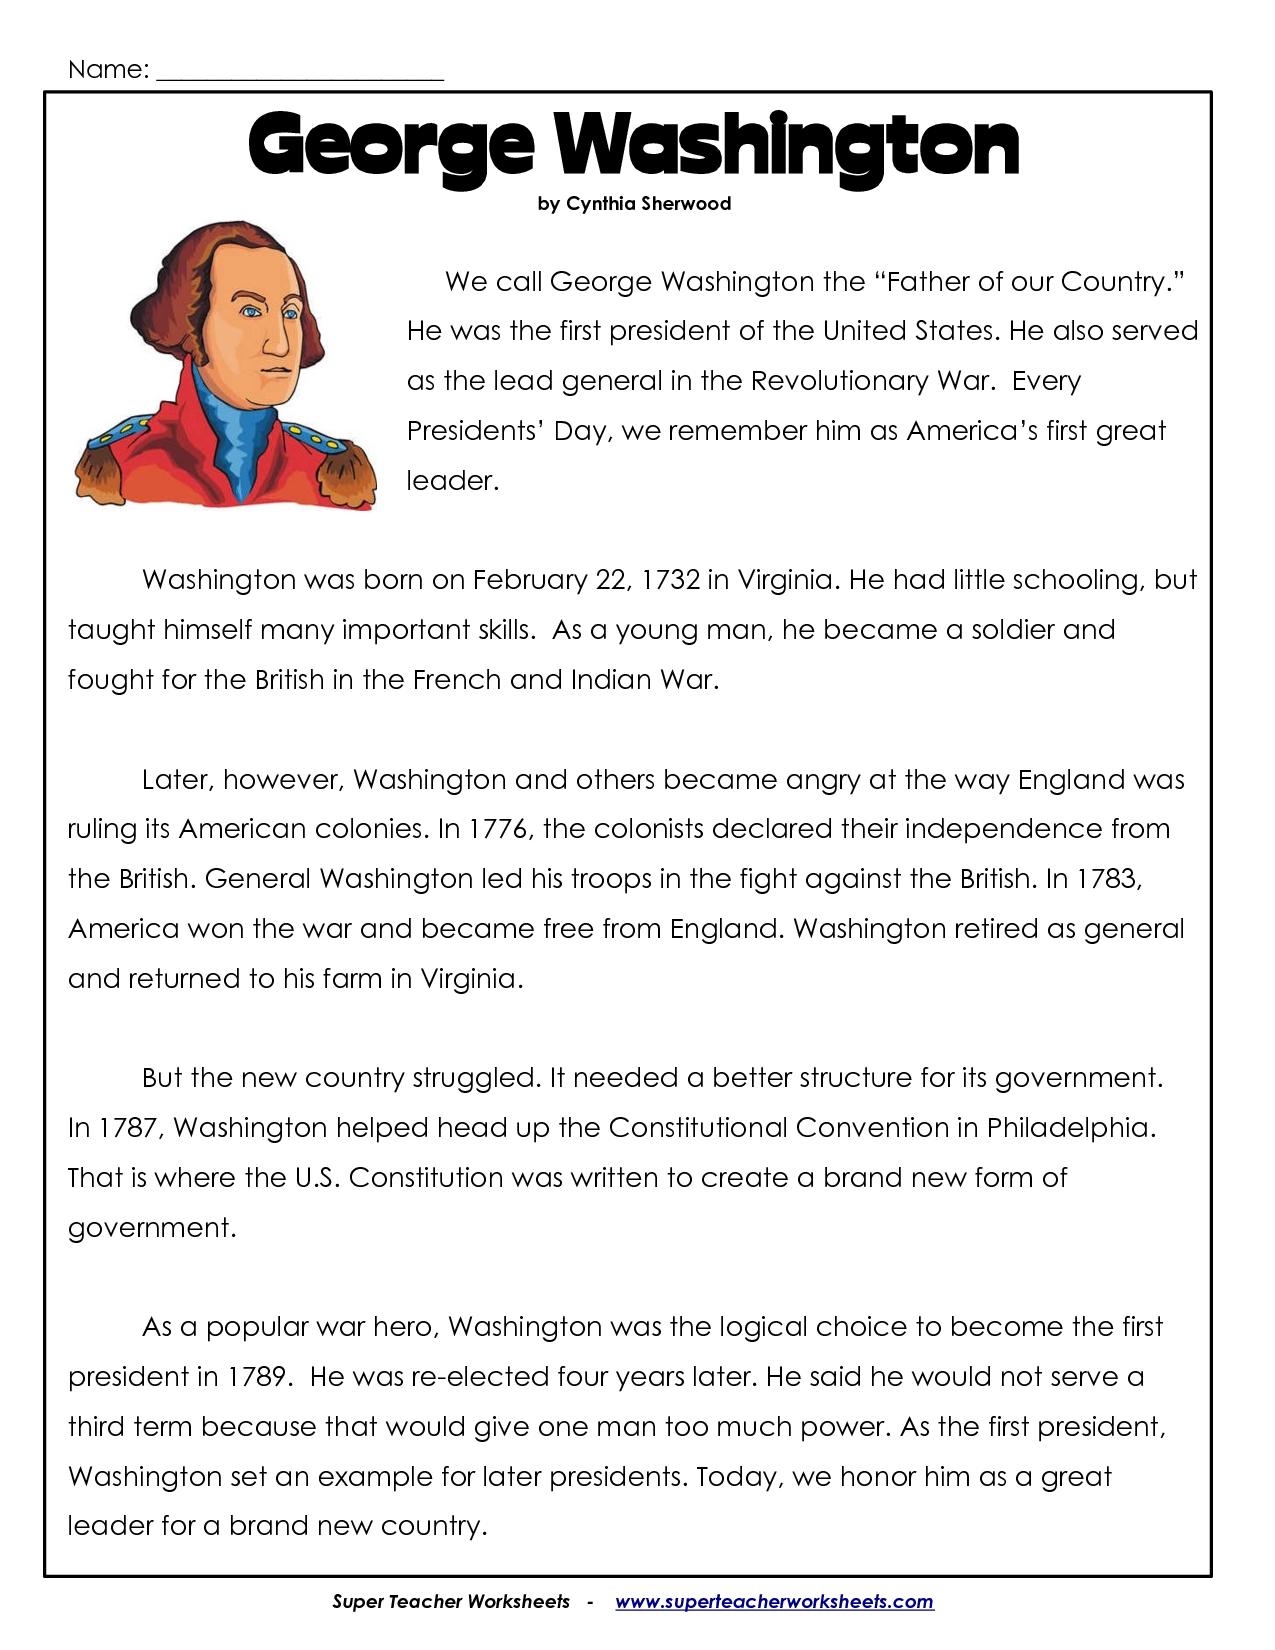 President's Day Coloring Worksheet   George Washington Worksheets - Free Printable George Washington Worksheets